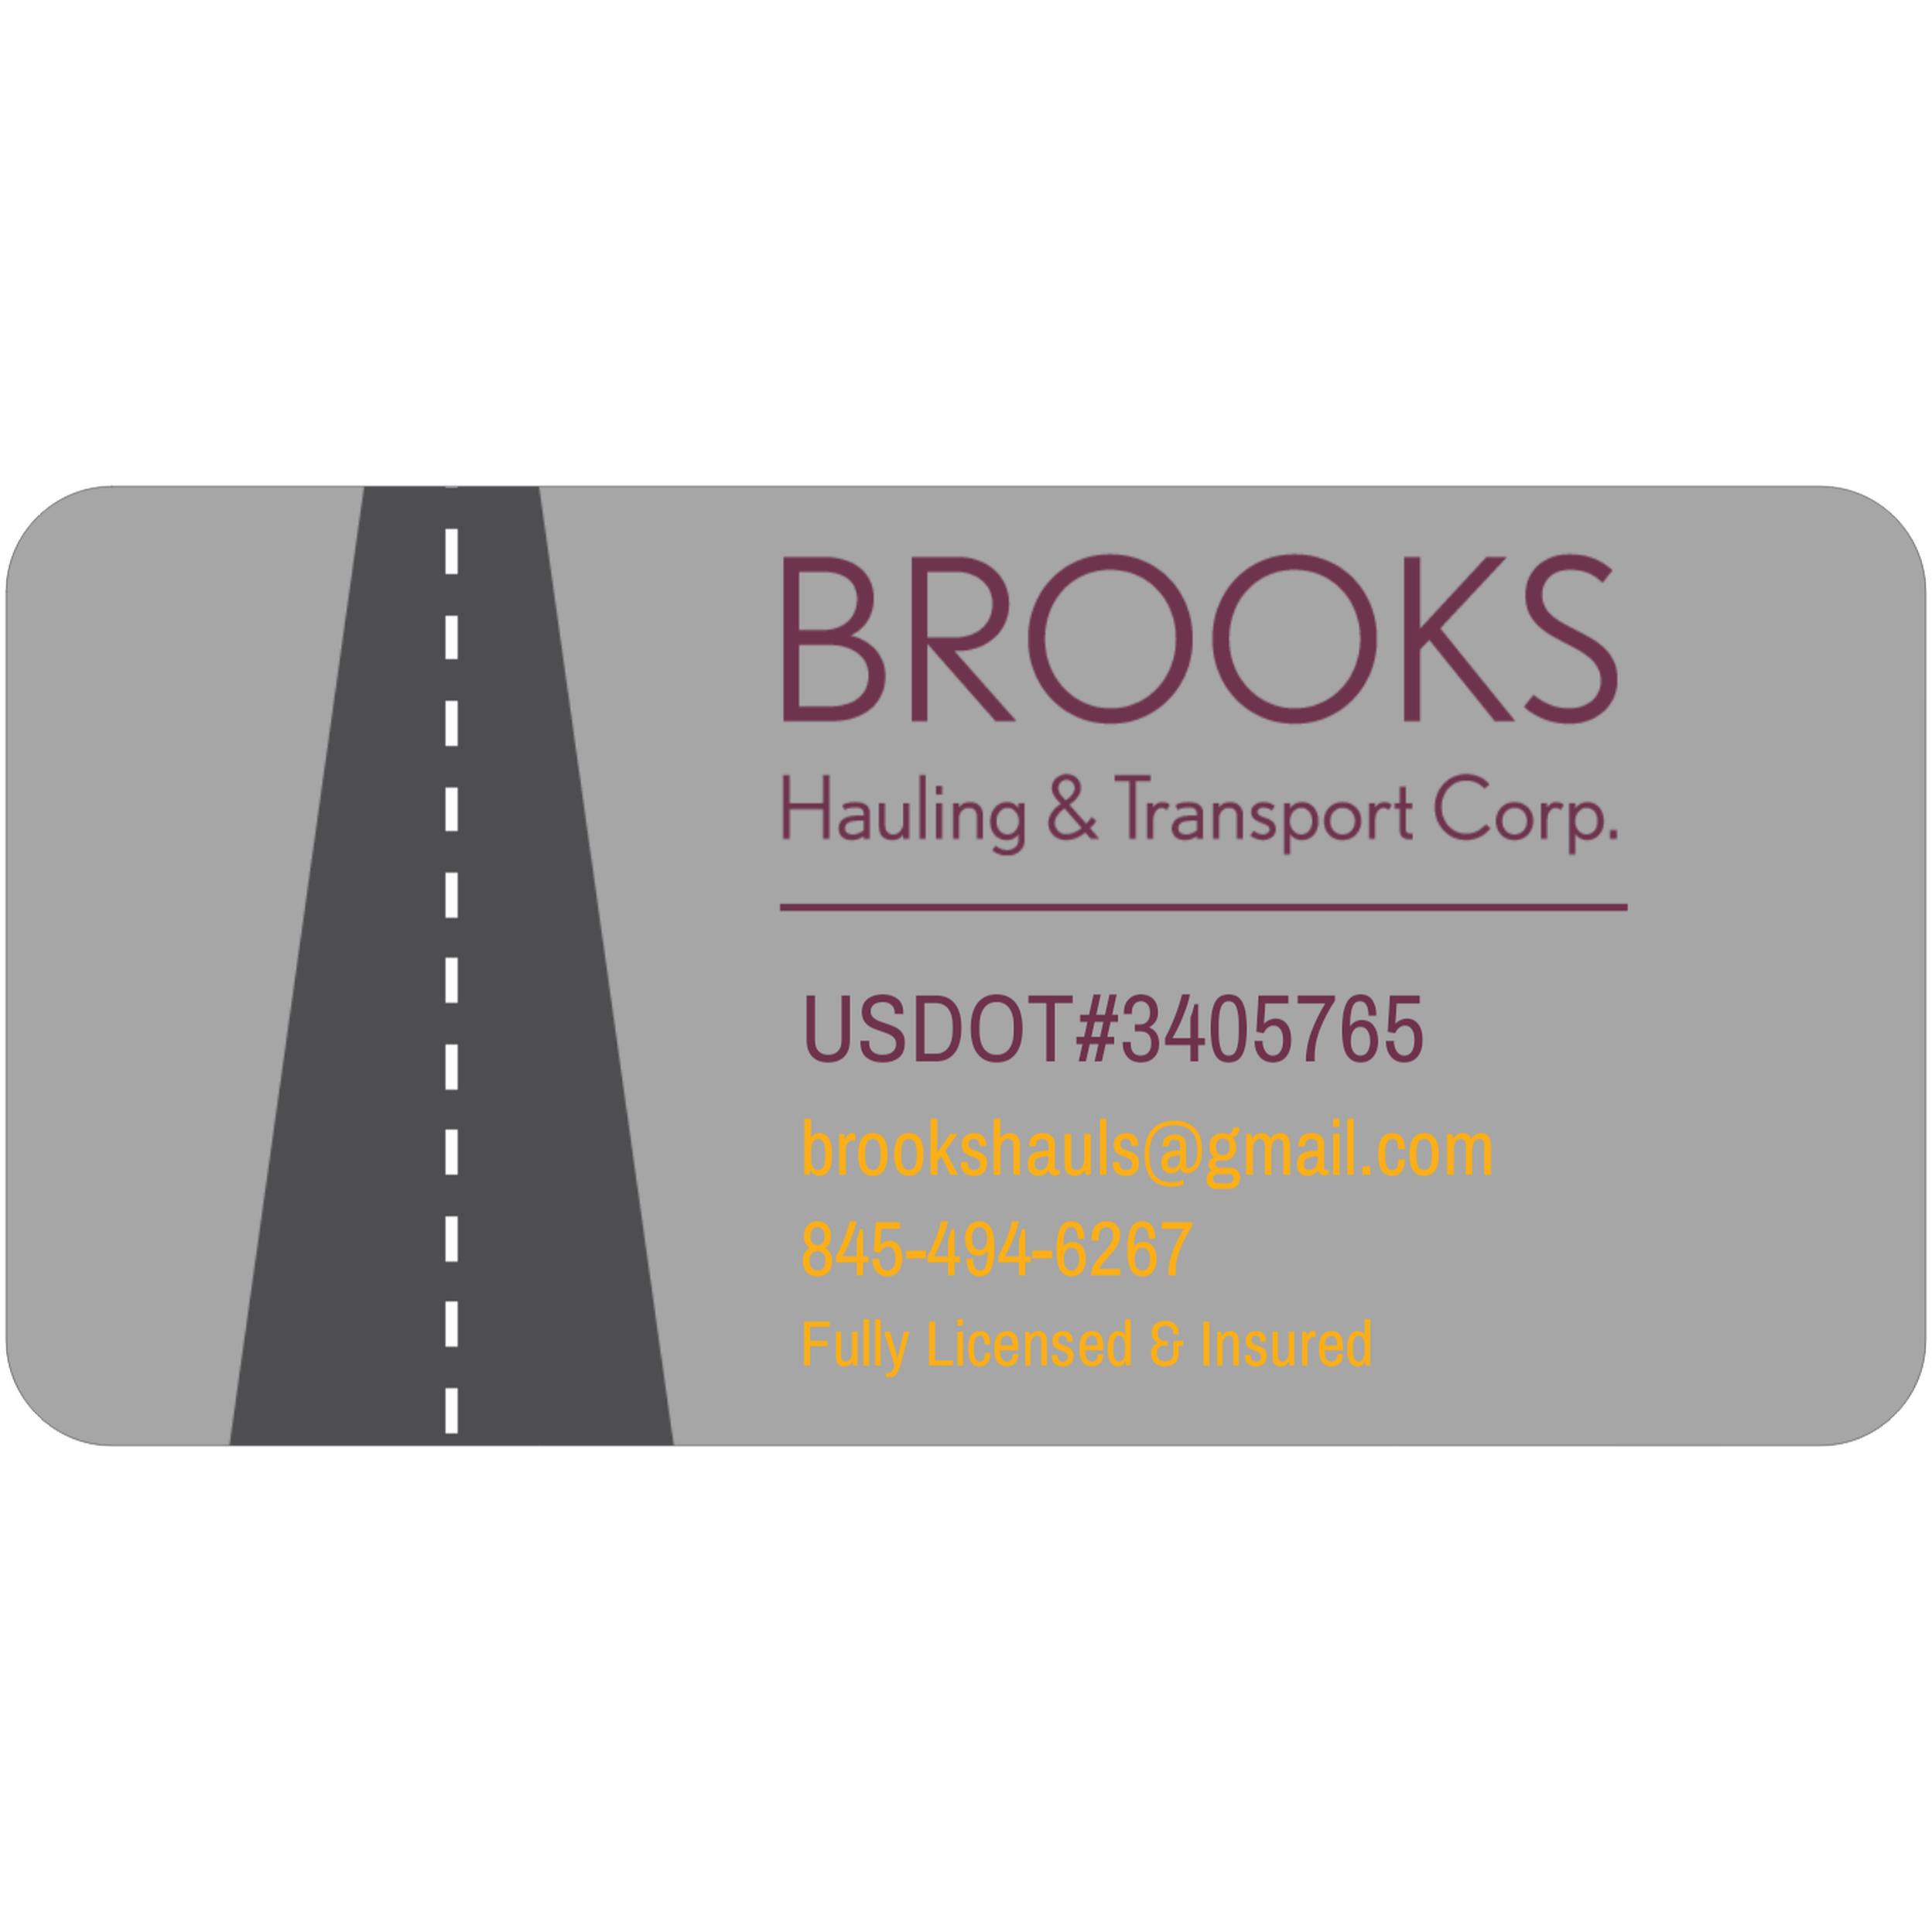 Brooks Hauling & Transport